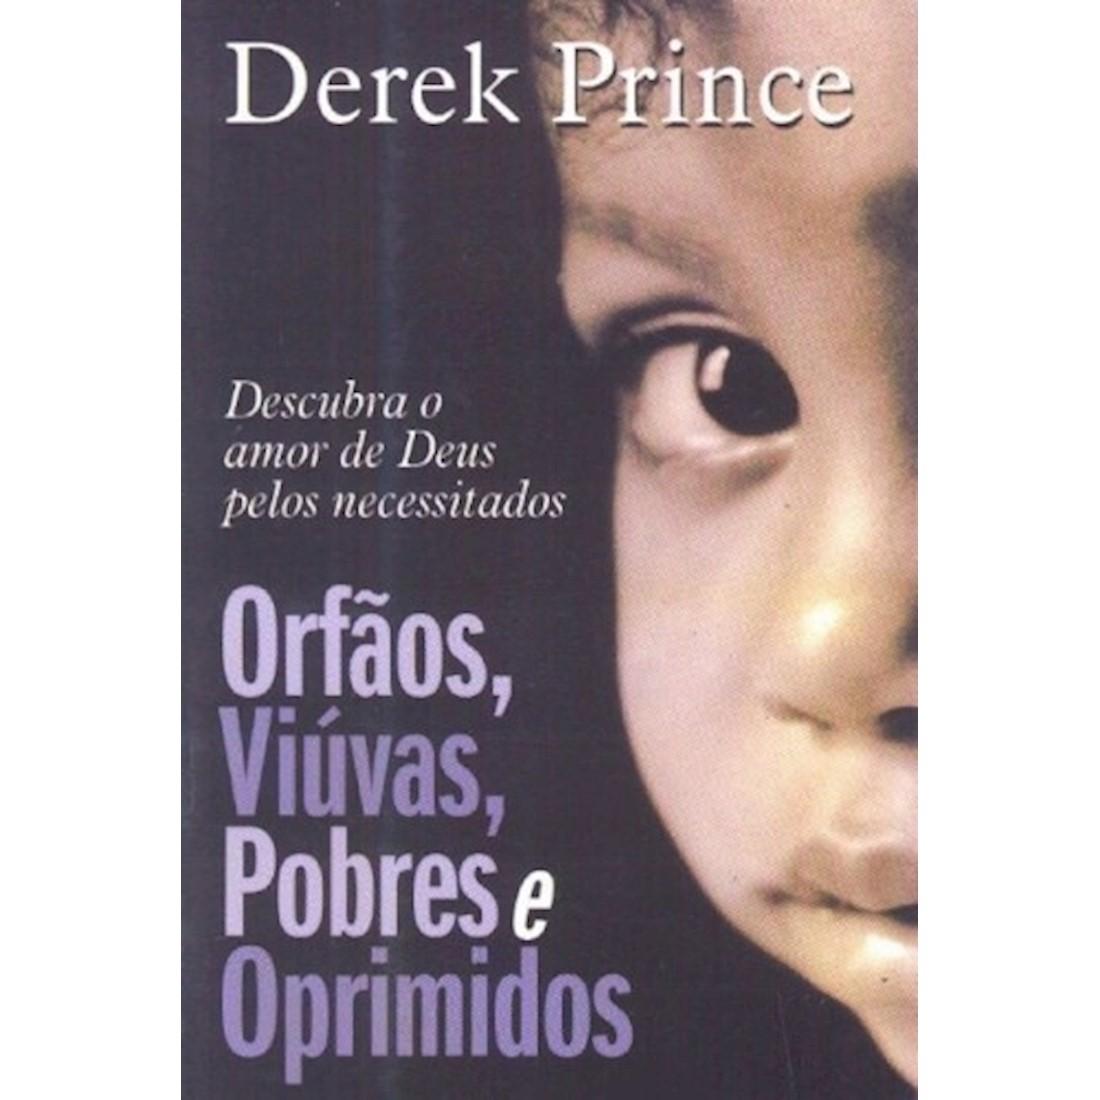 Livro Órfãos, Viúvas, Pobres e Oprimidos